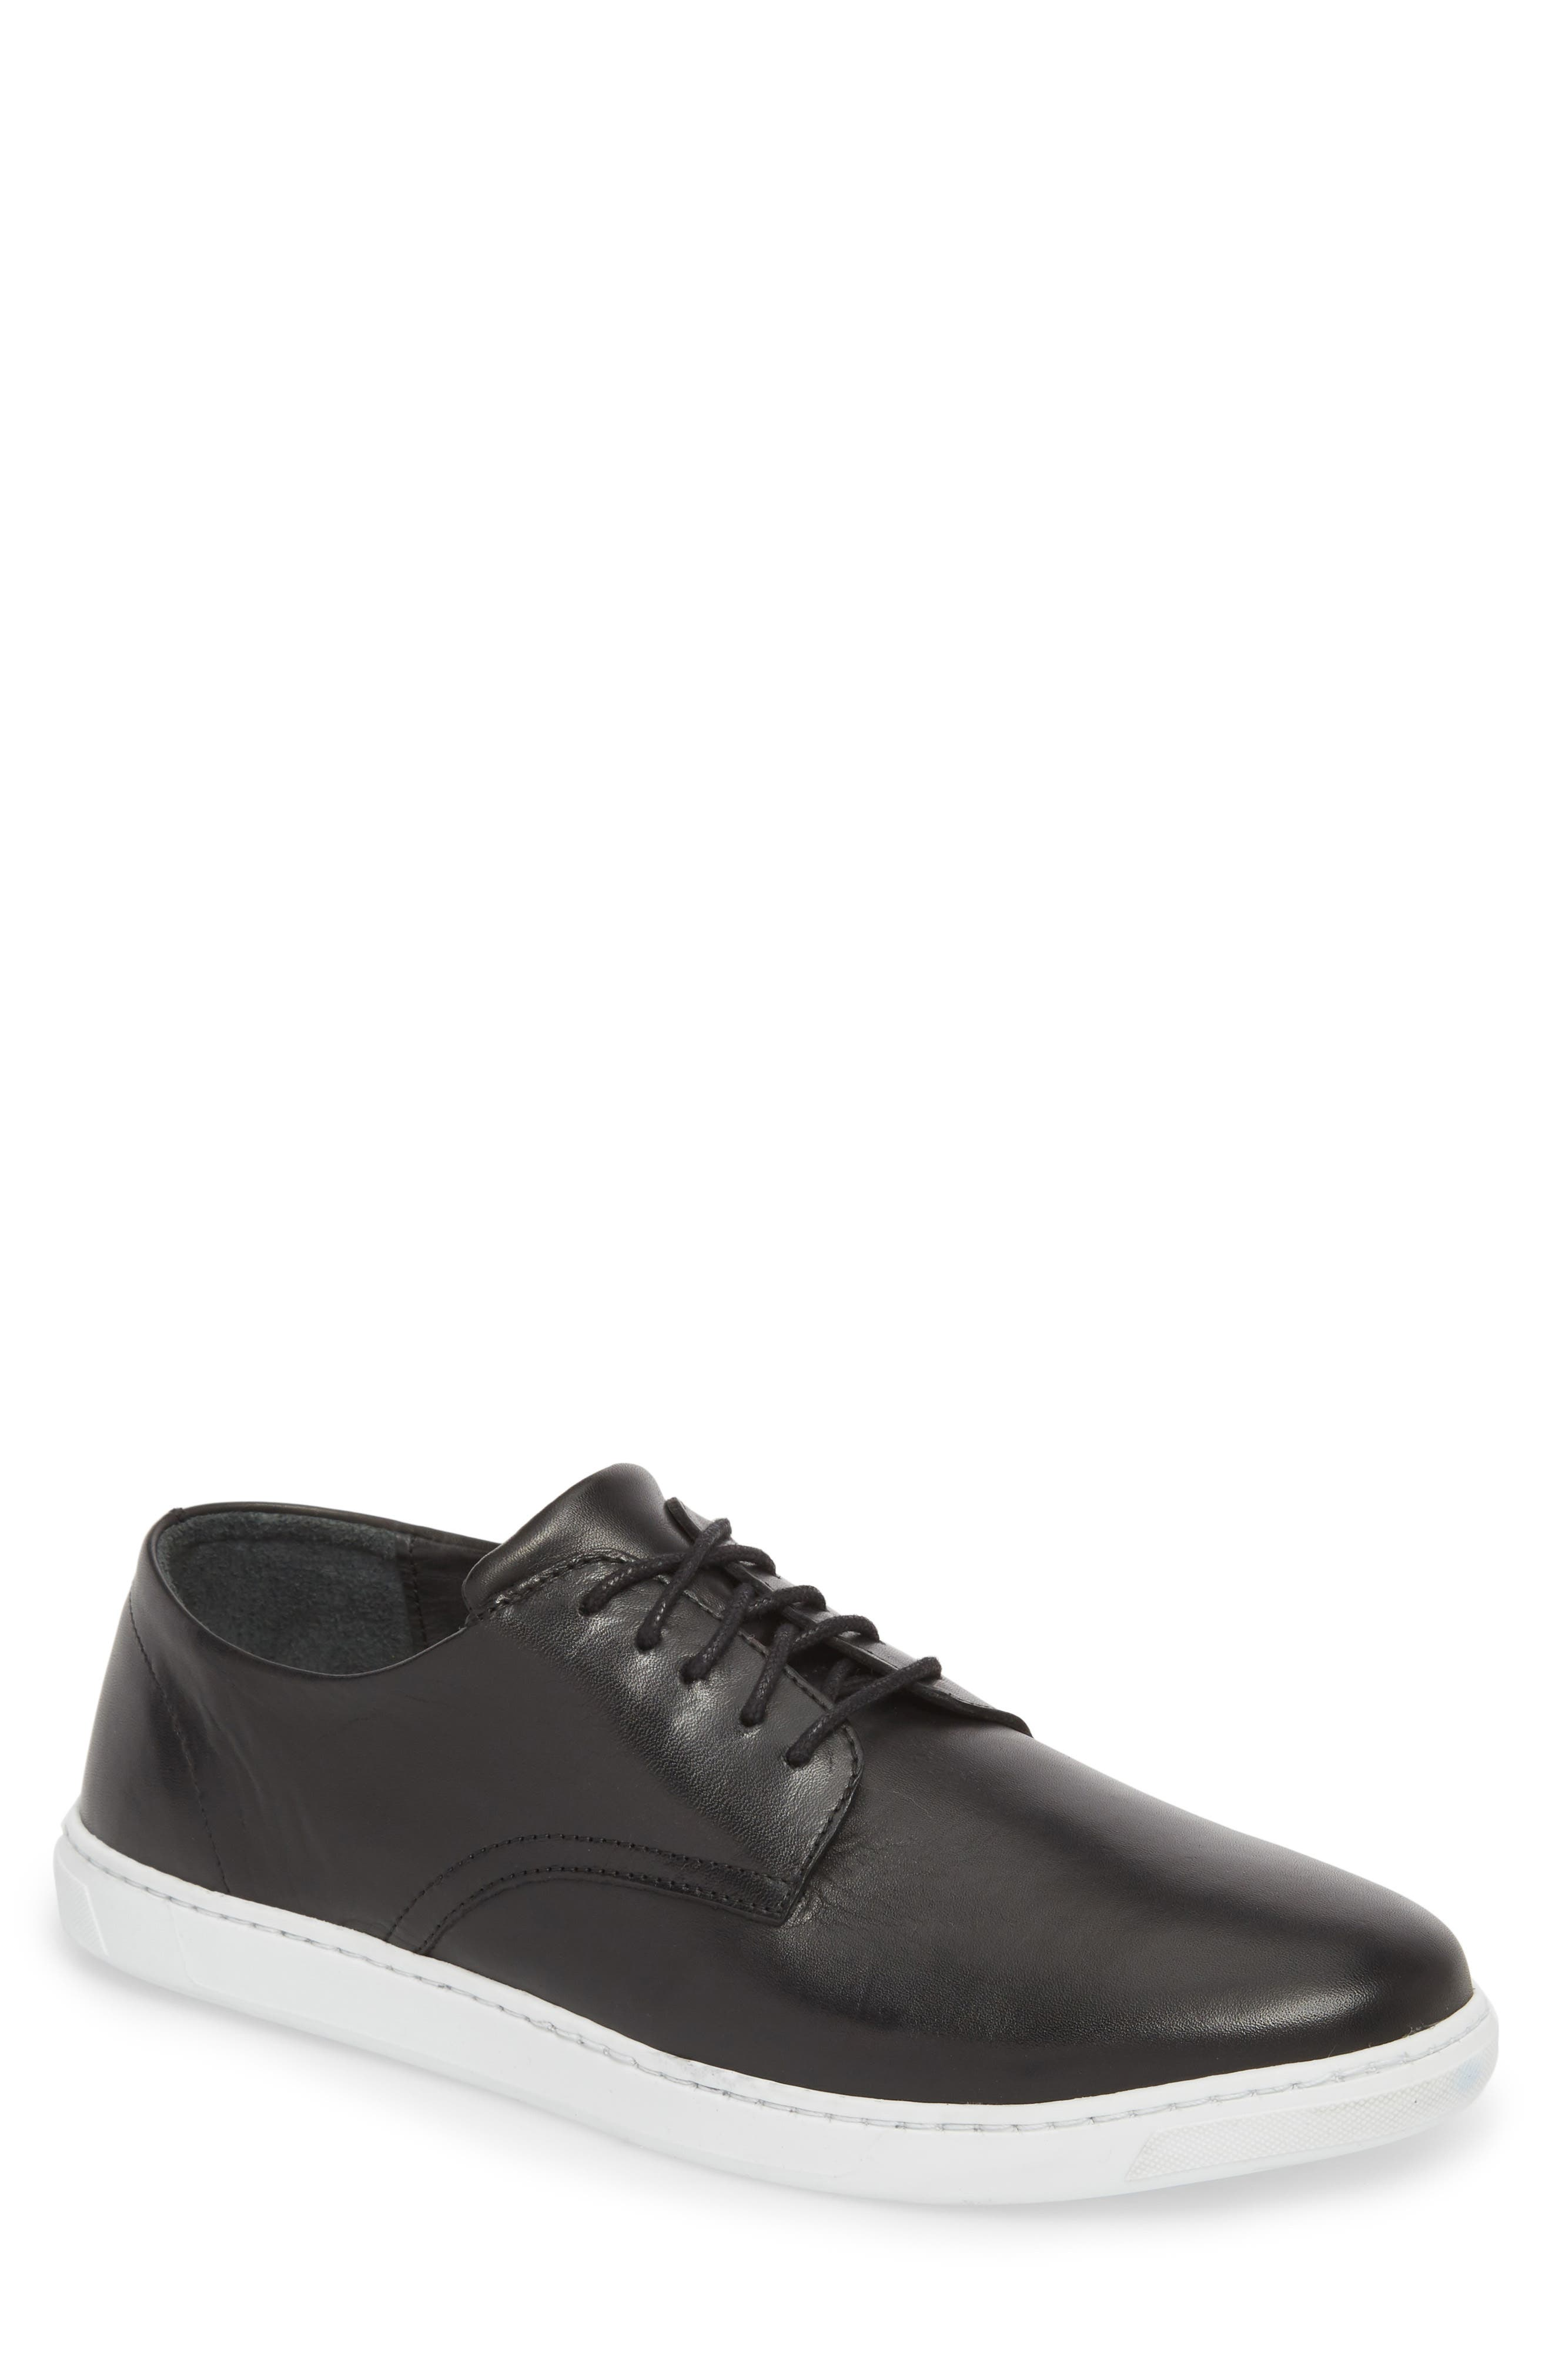 Nok Derby Sneaker,                             Main thumbnail 1, color,                             BLACK LEATHER